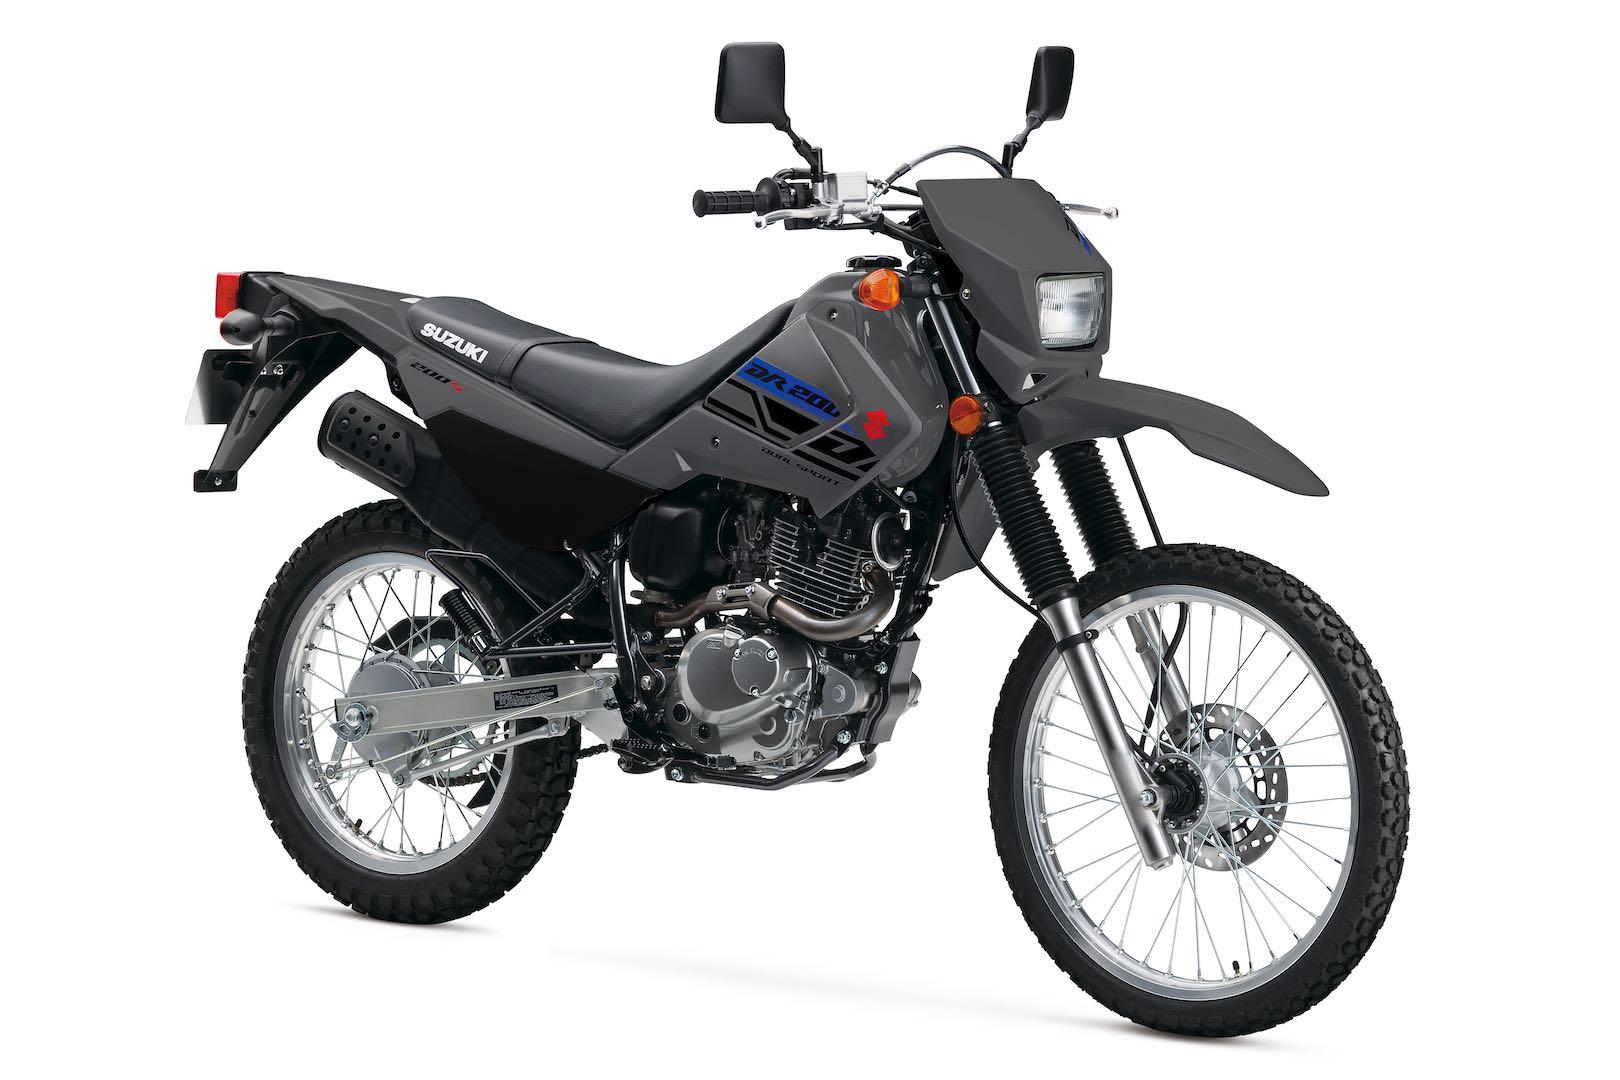 2020 Suzuki DR200S Buyer's Guide: Specs & Price